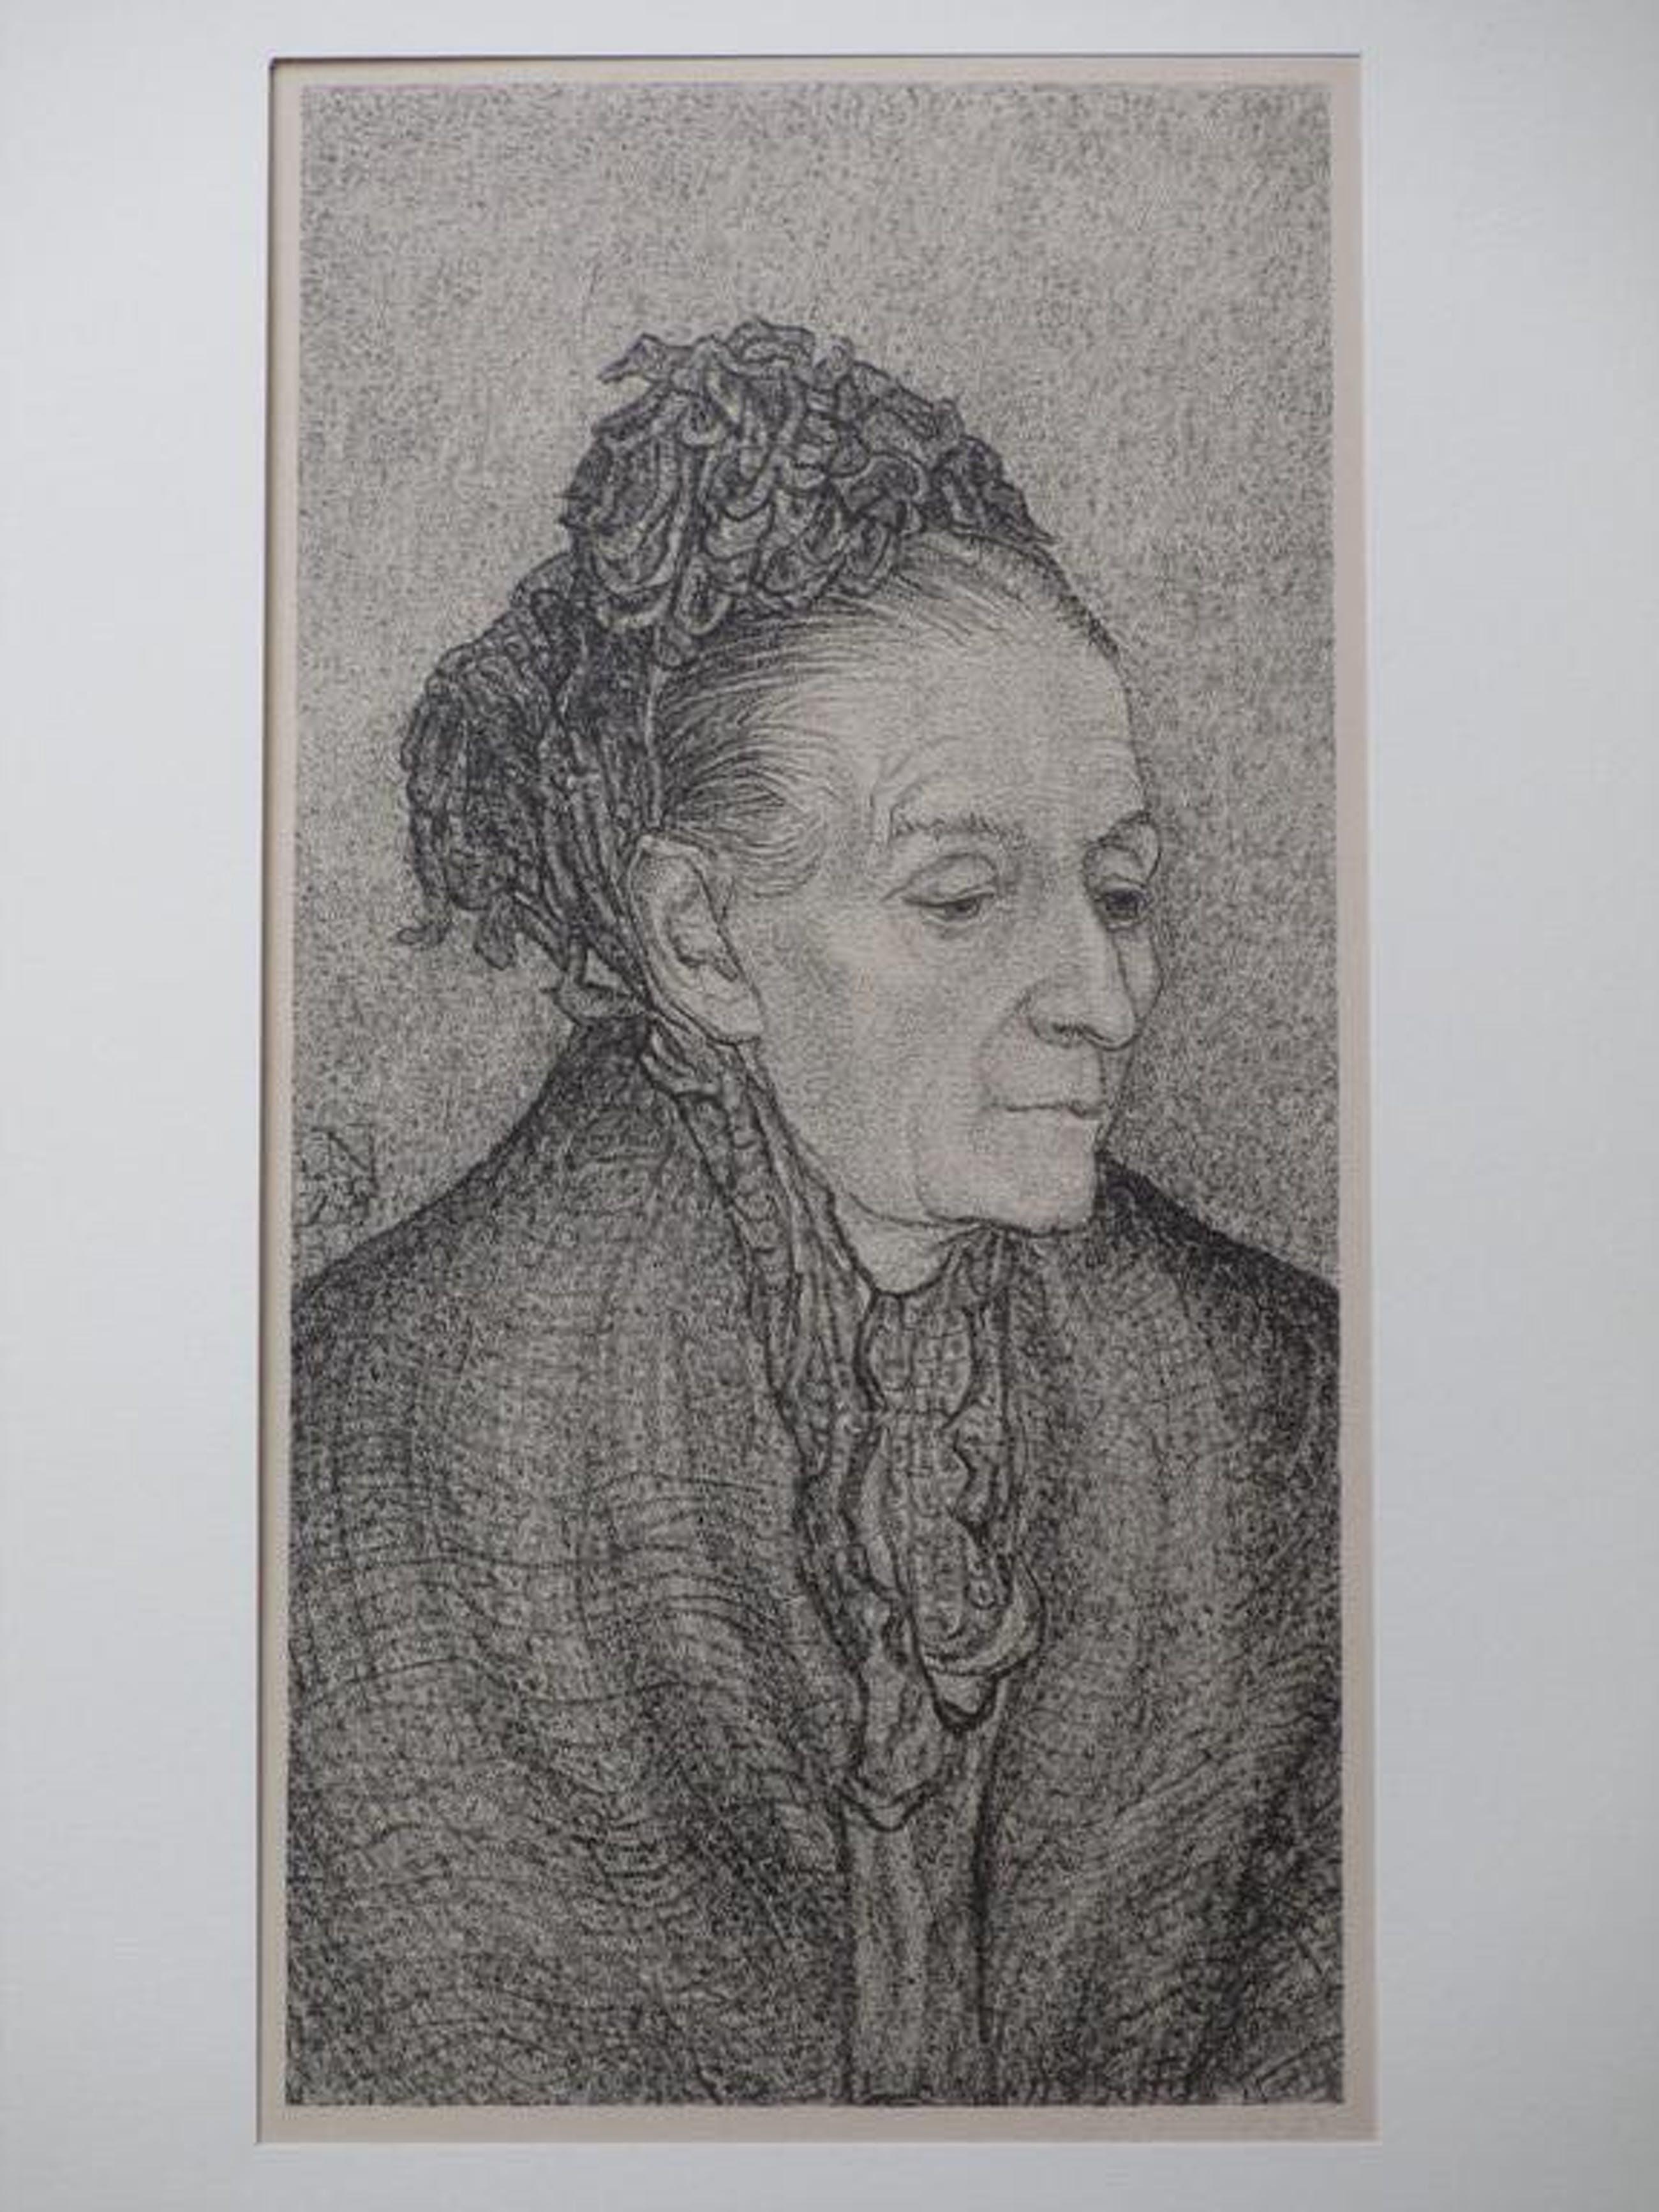 Jacob Nieweg, Litho, Vrouwportret kopen? Bied vanaf 45!